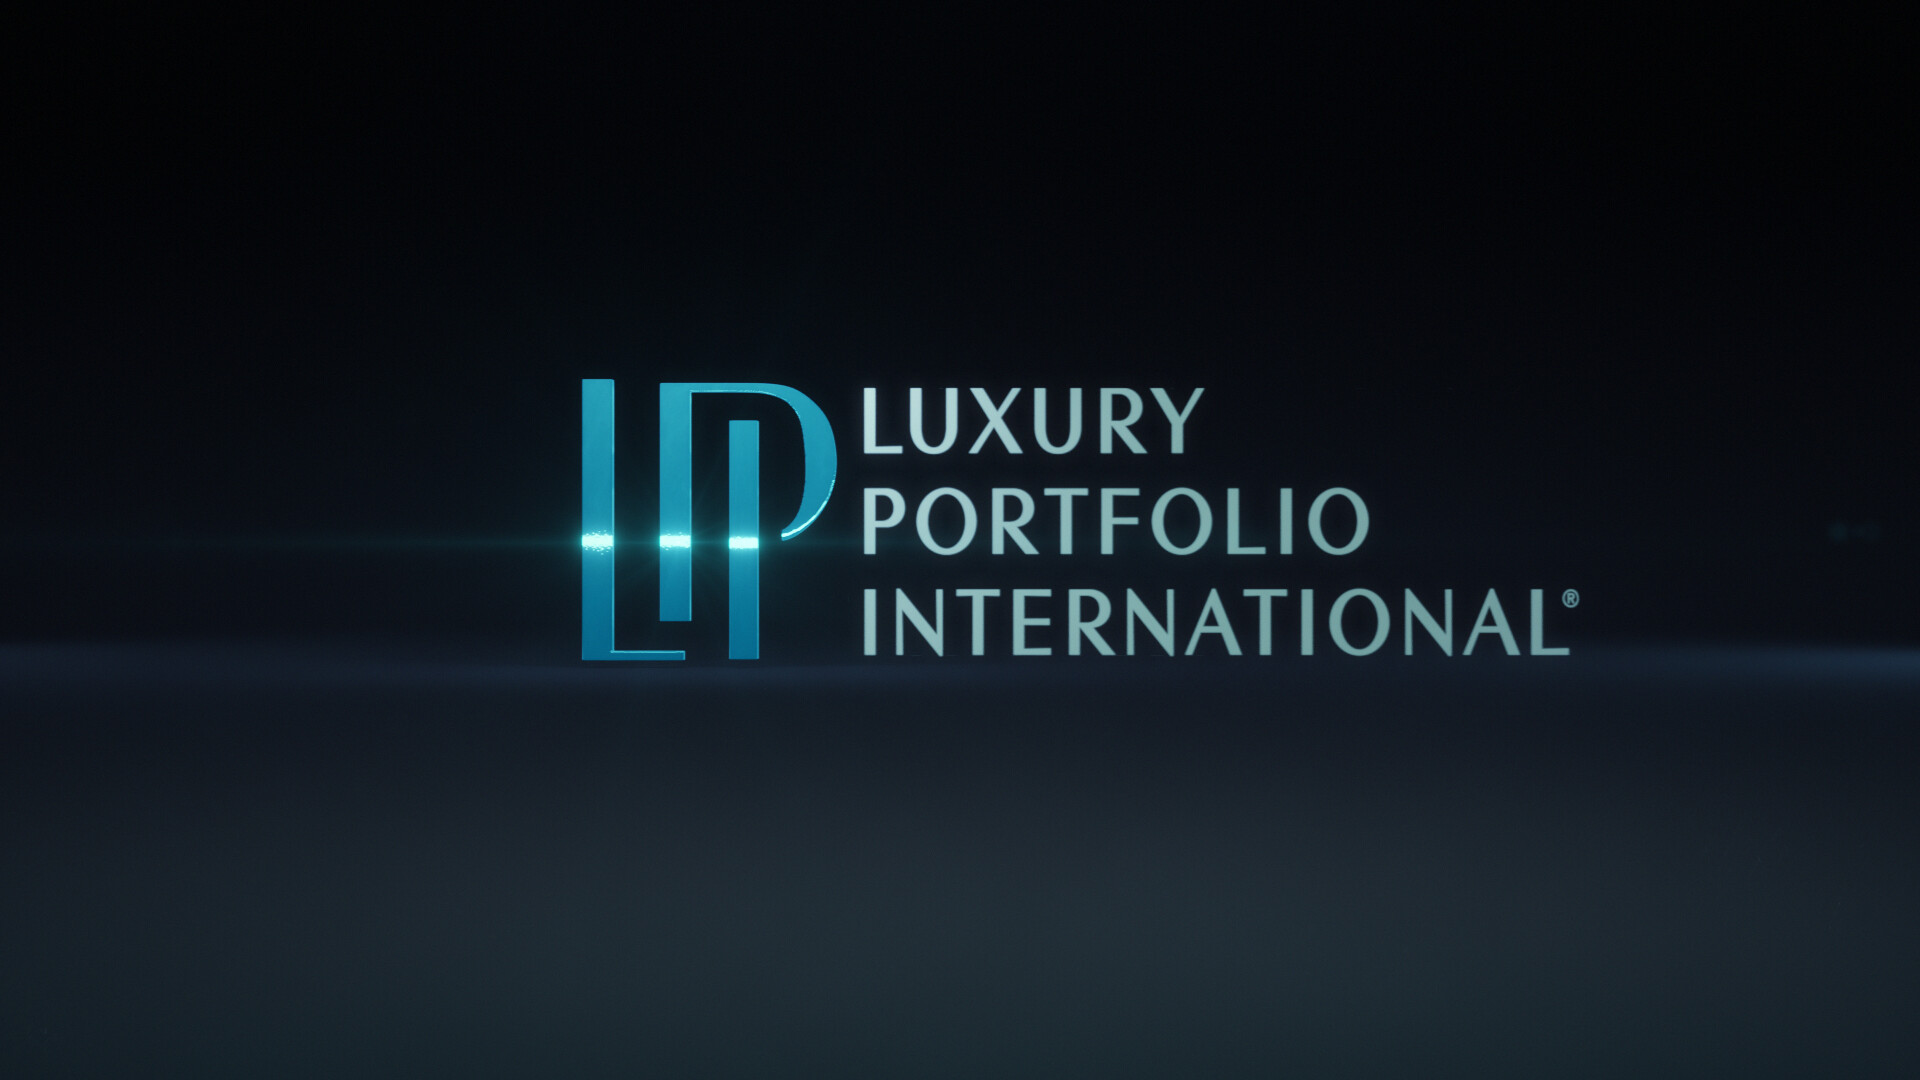 Luxury Portfolio International Logo Animation